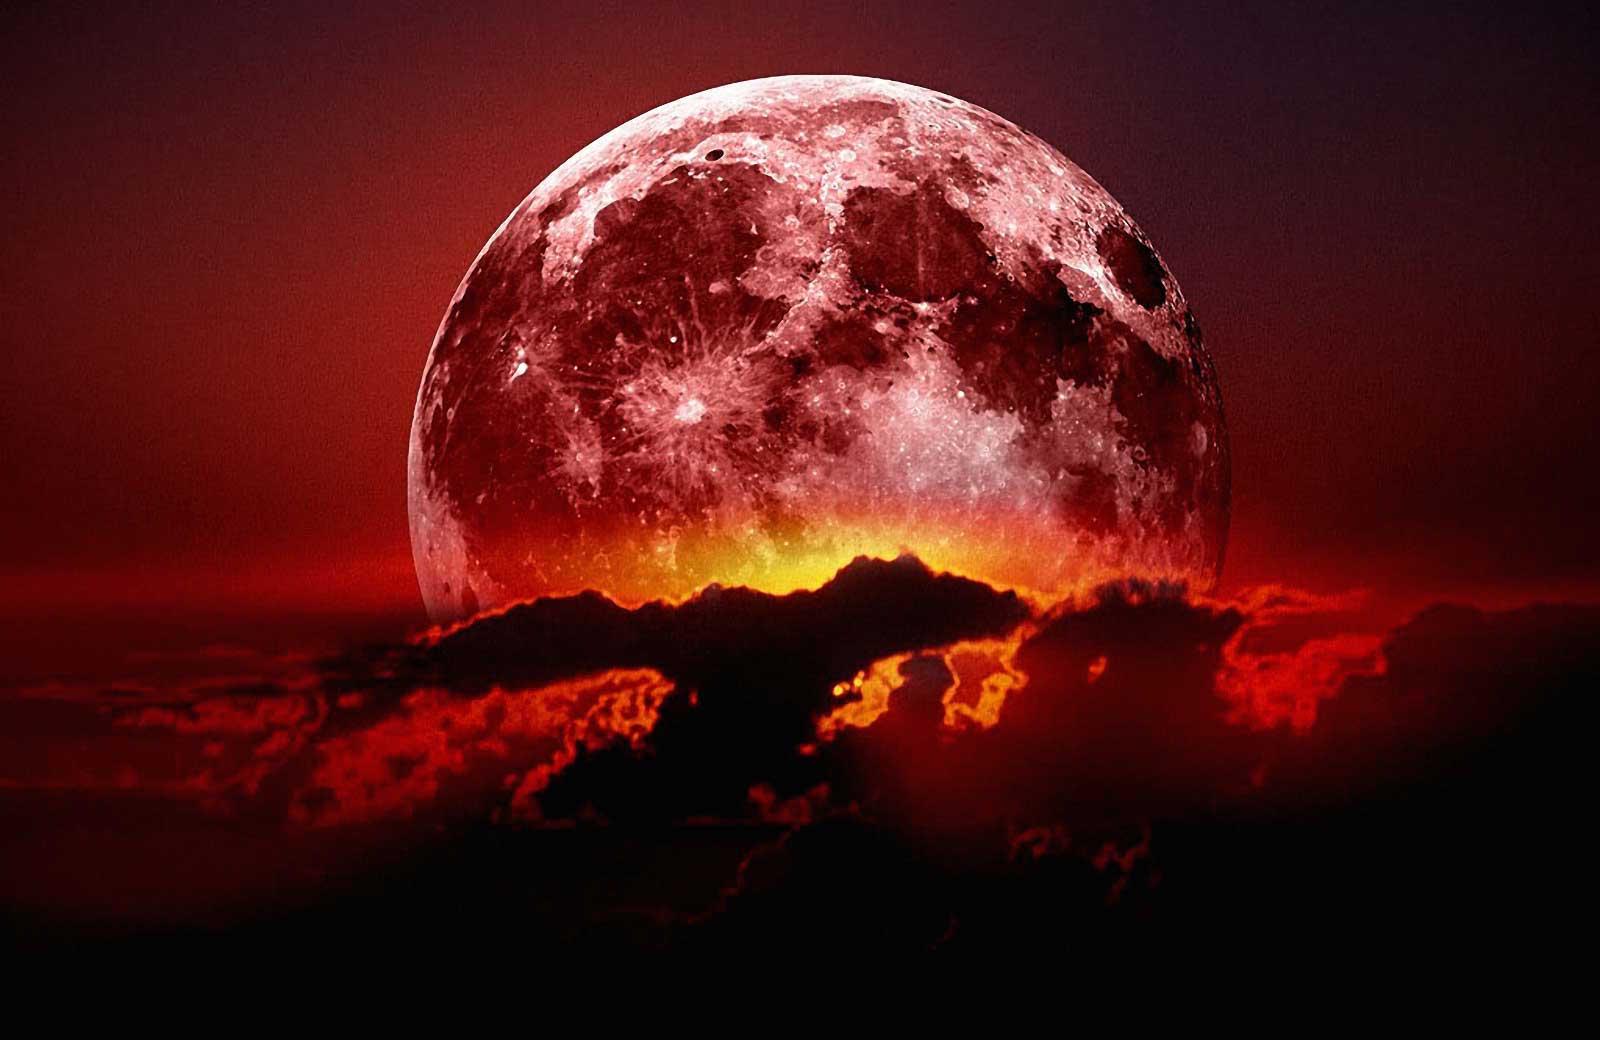 blood-moon-graphic3.jpg